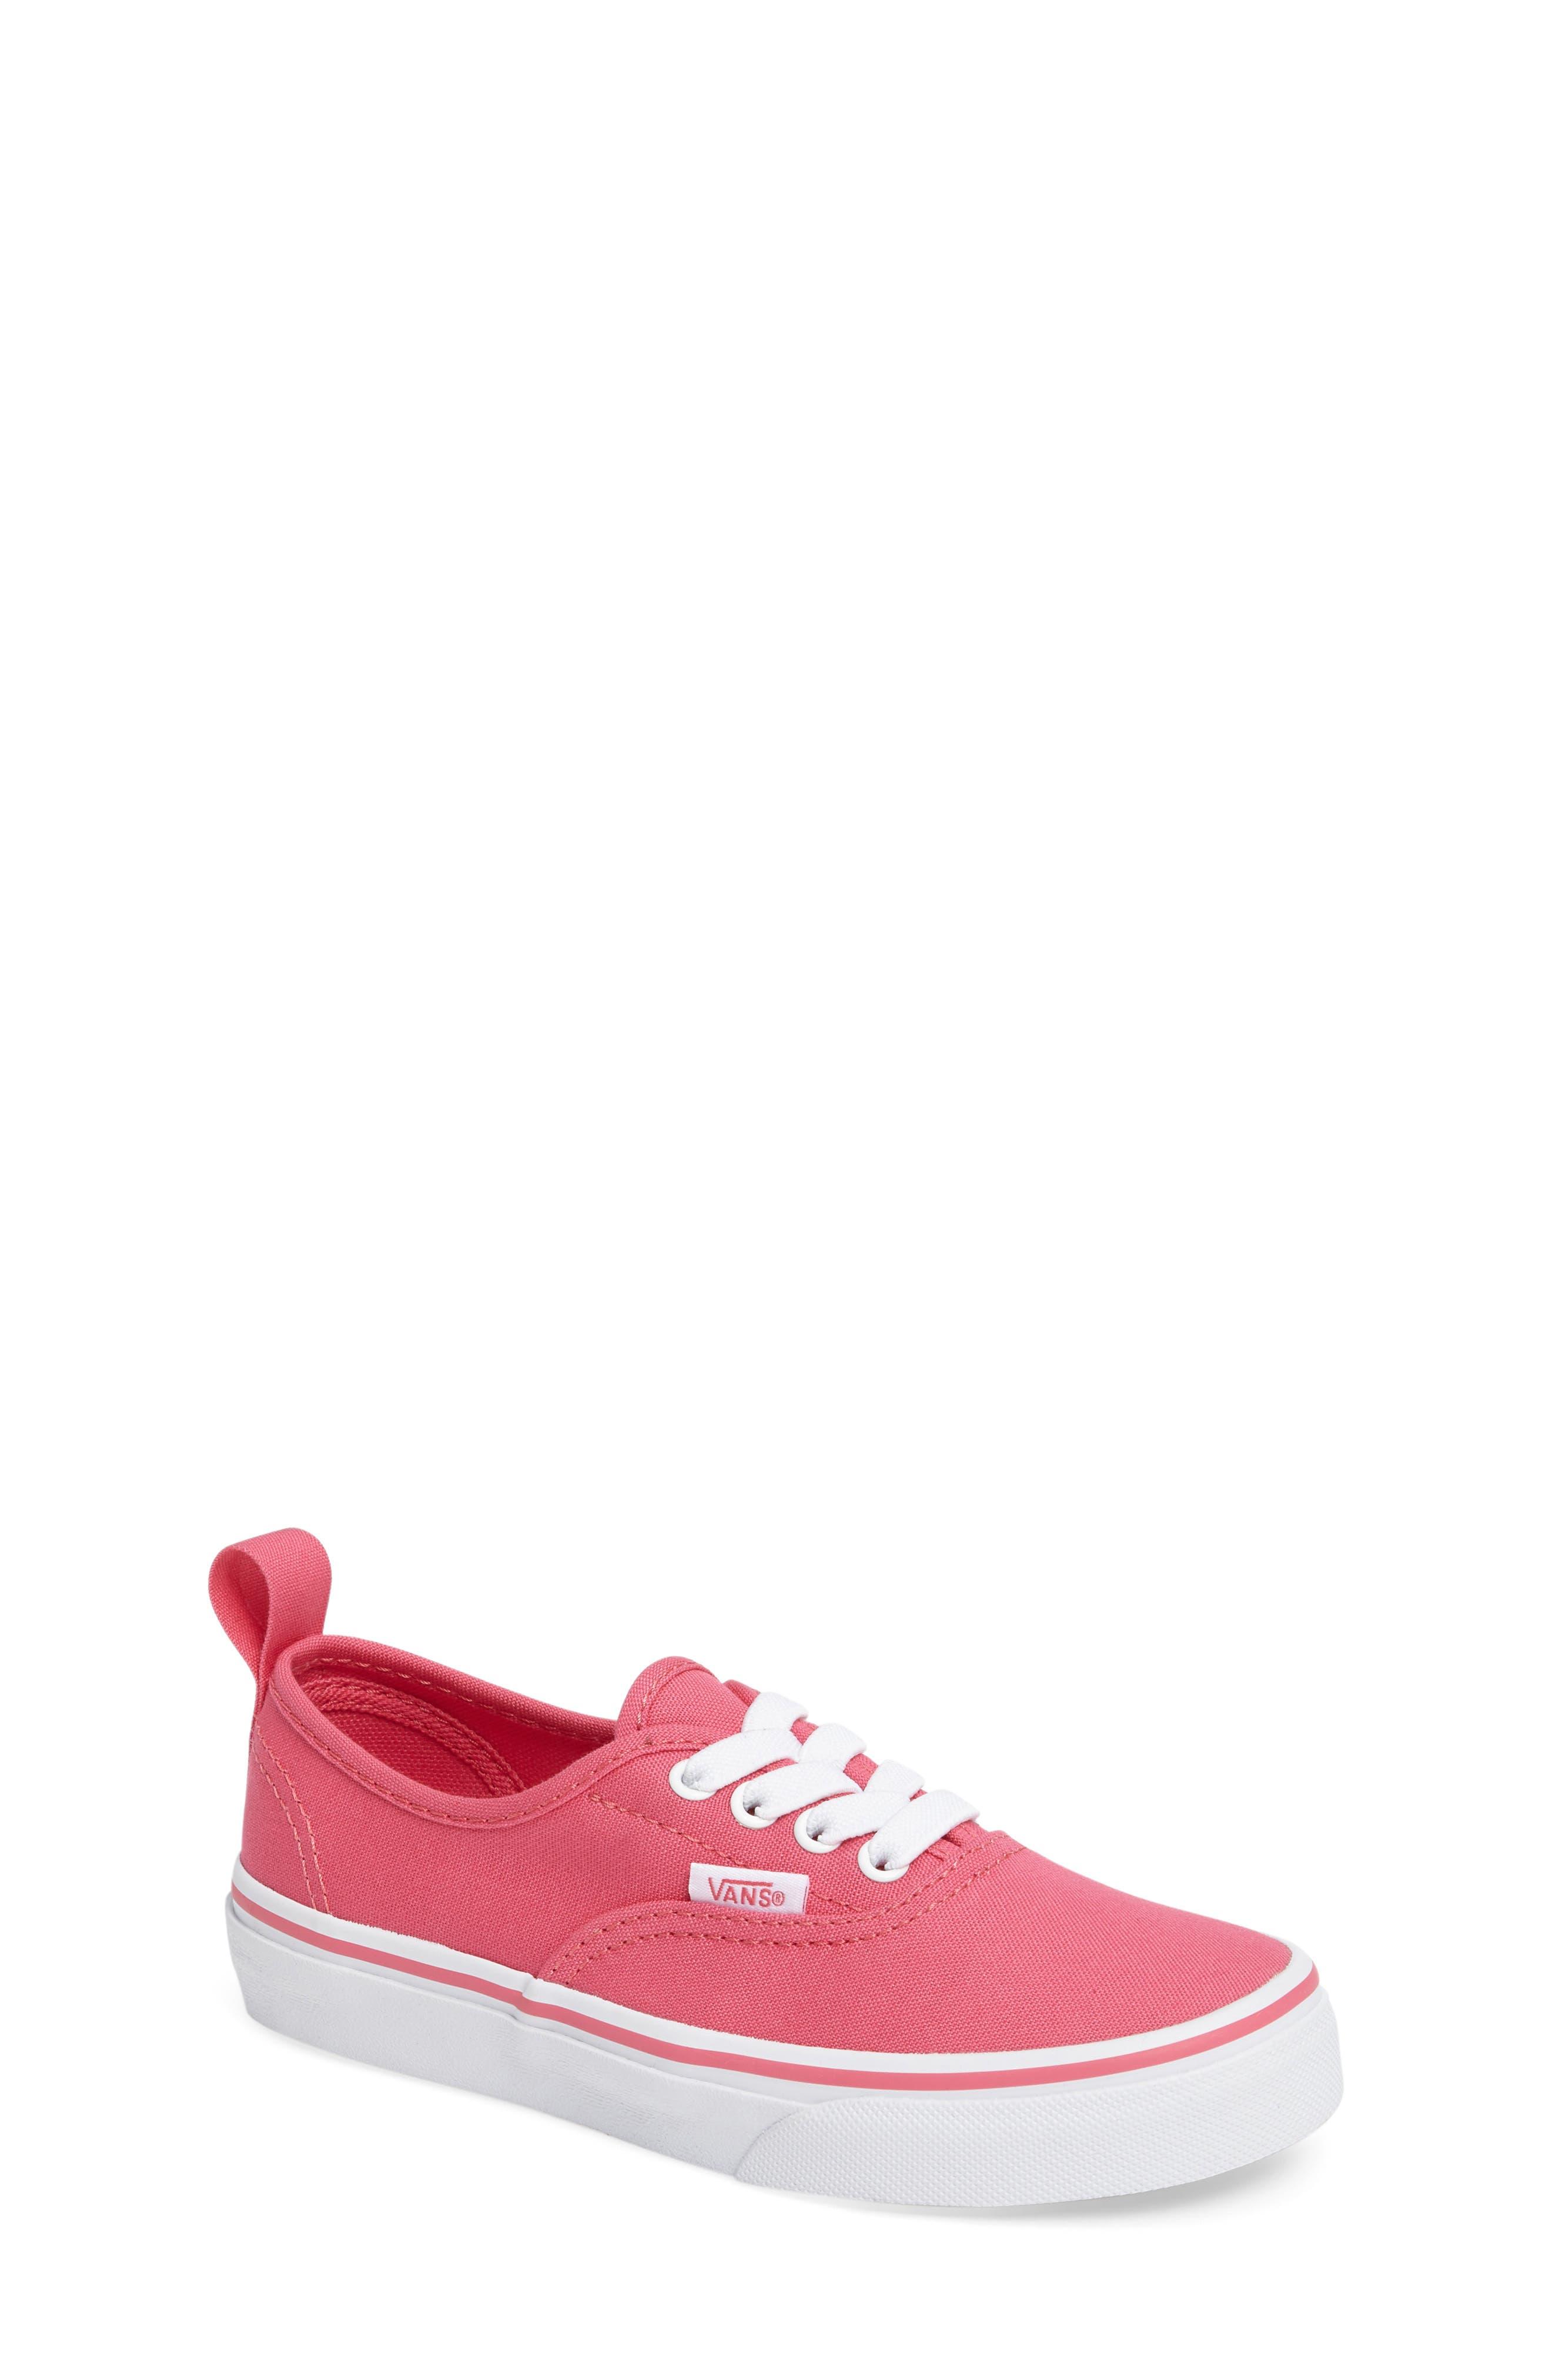 Main Image - Vans Authentic Elastic Lace Sneaker (Baby, Walker, Toddler, Little Kid & Big Kid)